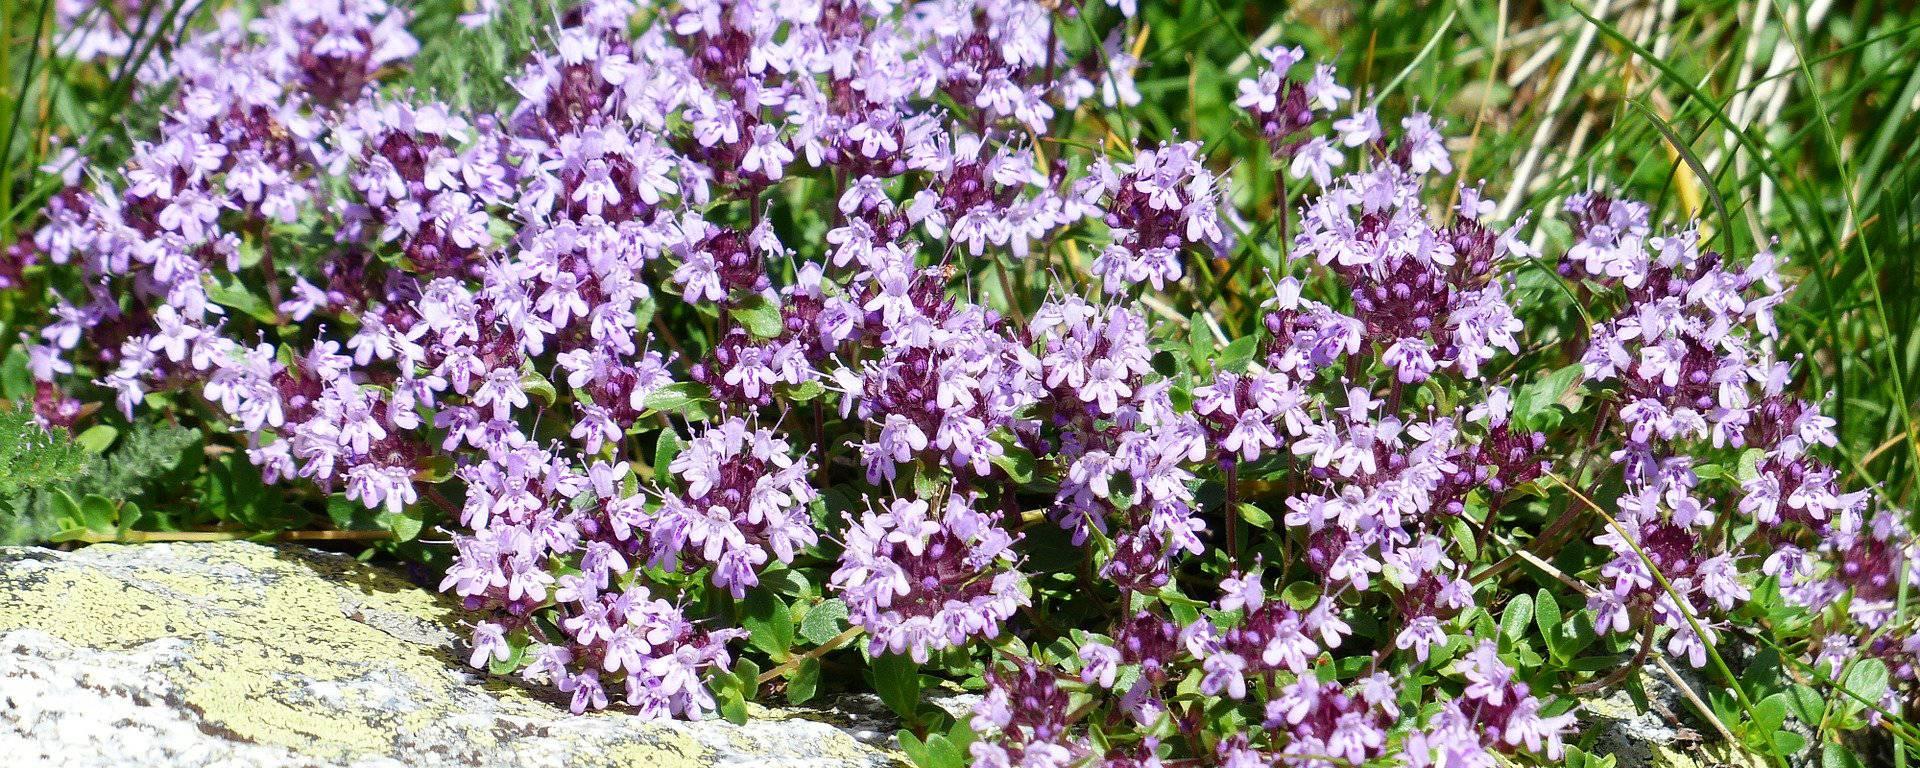 thym tisane bien-être cocconing herbes plantes nature